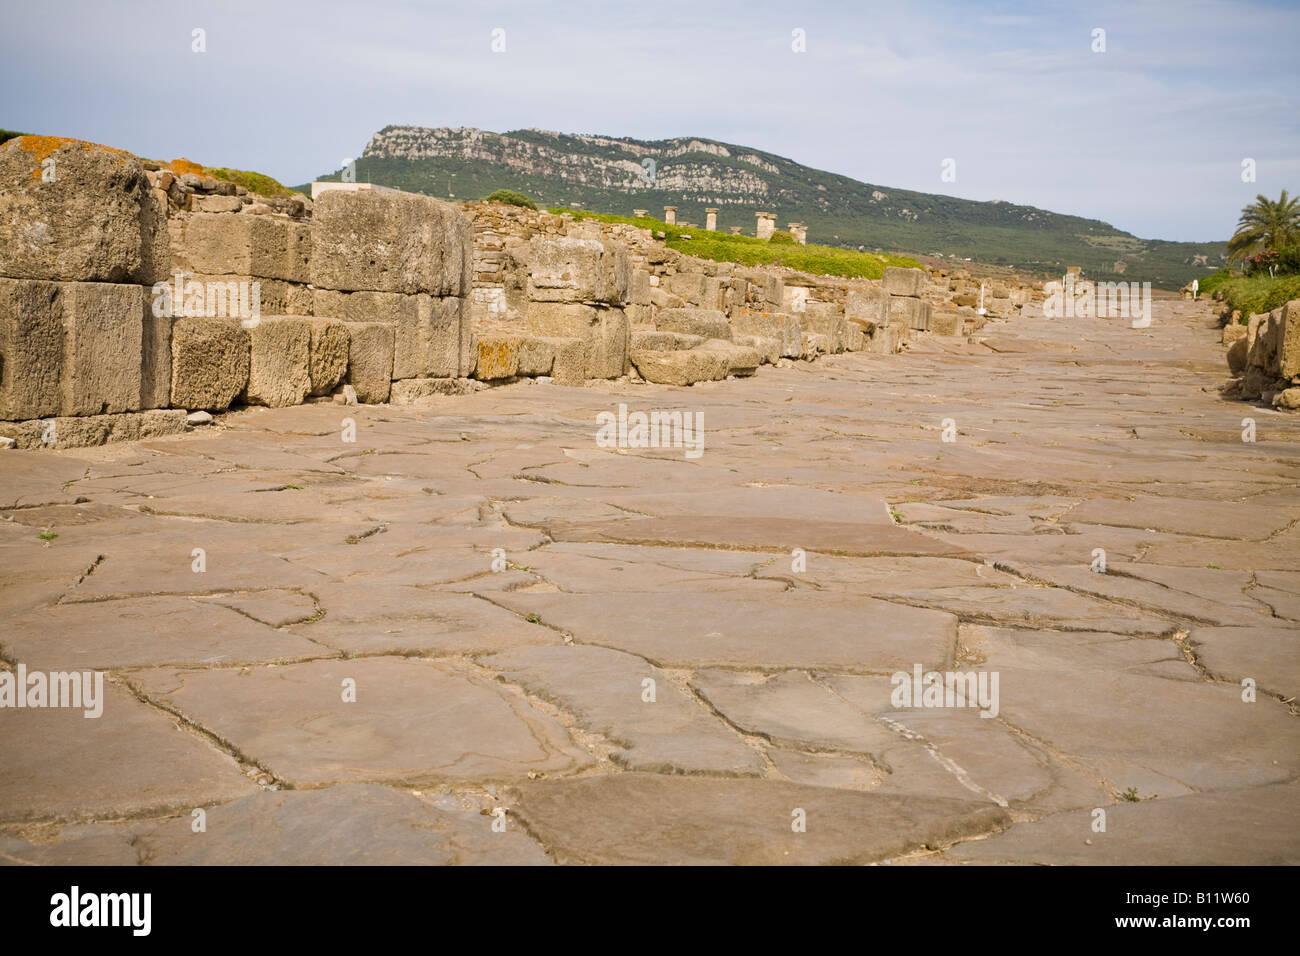 Decumanus Maximus The Main Street In The Roman Archaeological Site